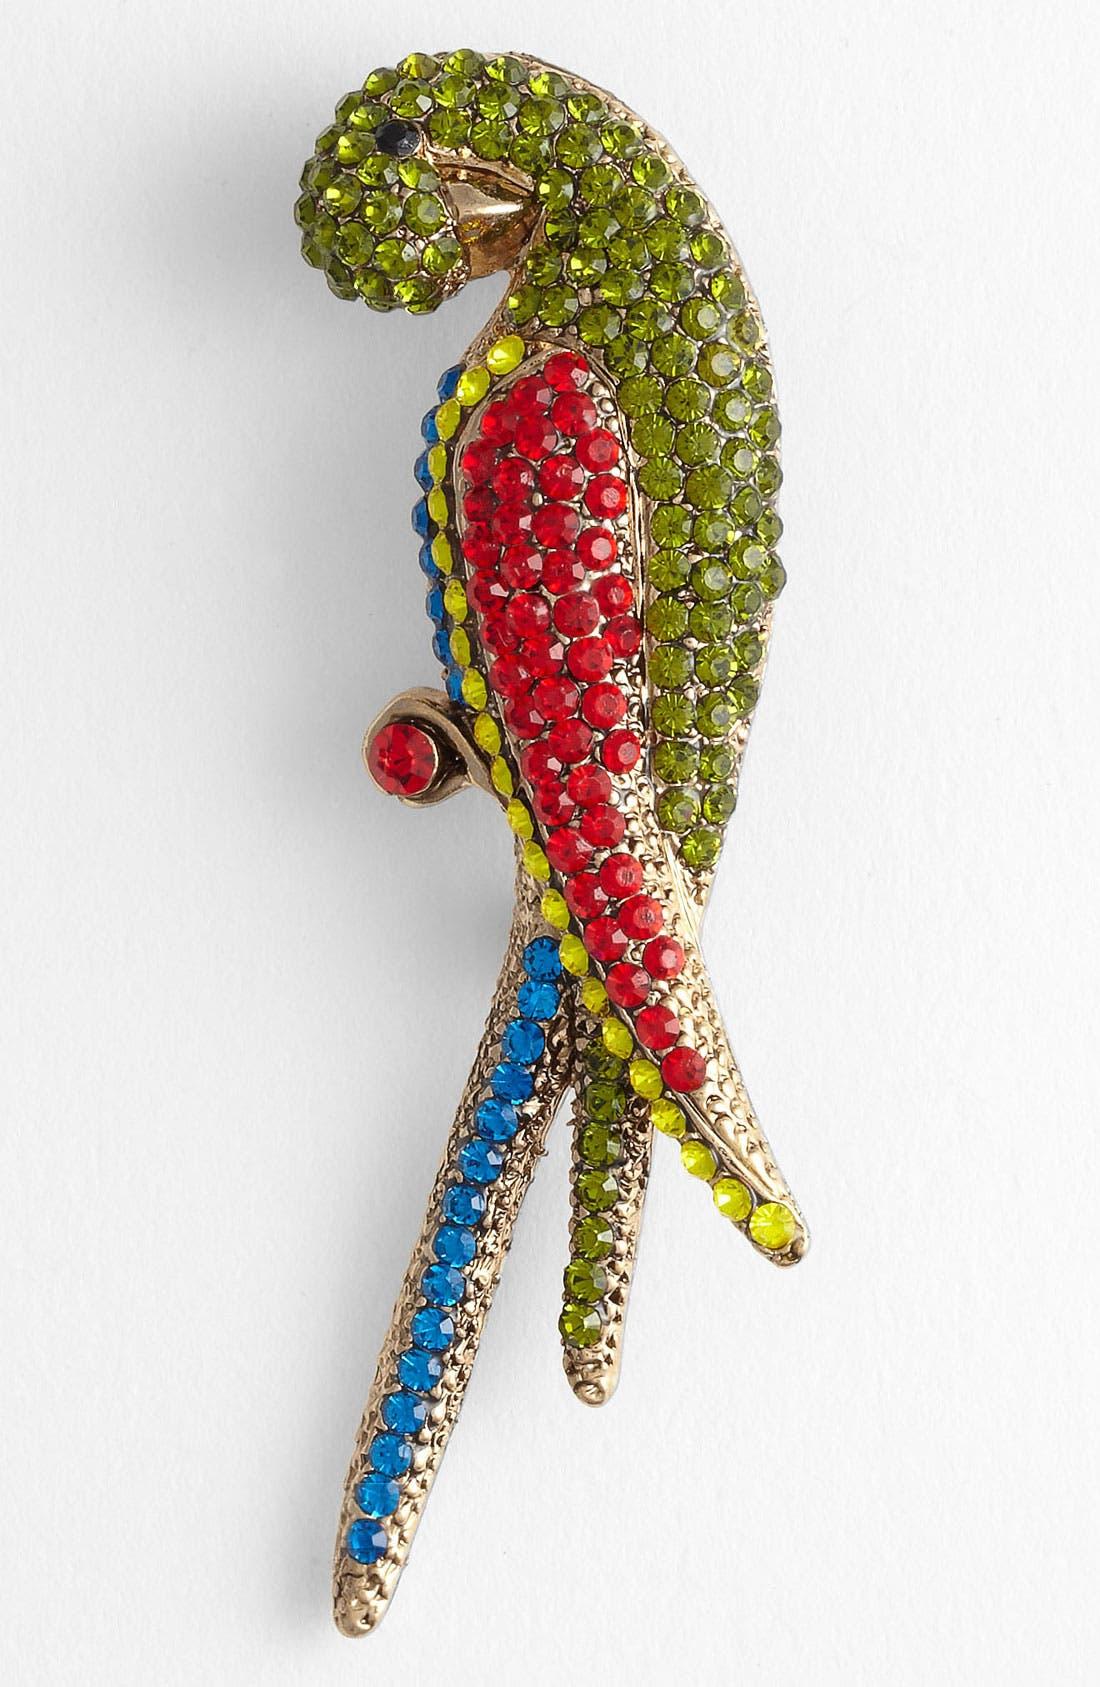 Main Image - Tasha 'Critters' Parrot Brooch